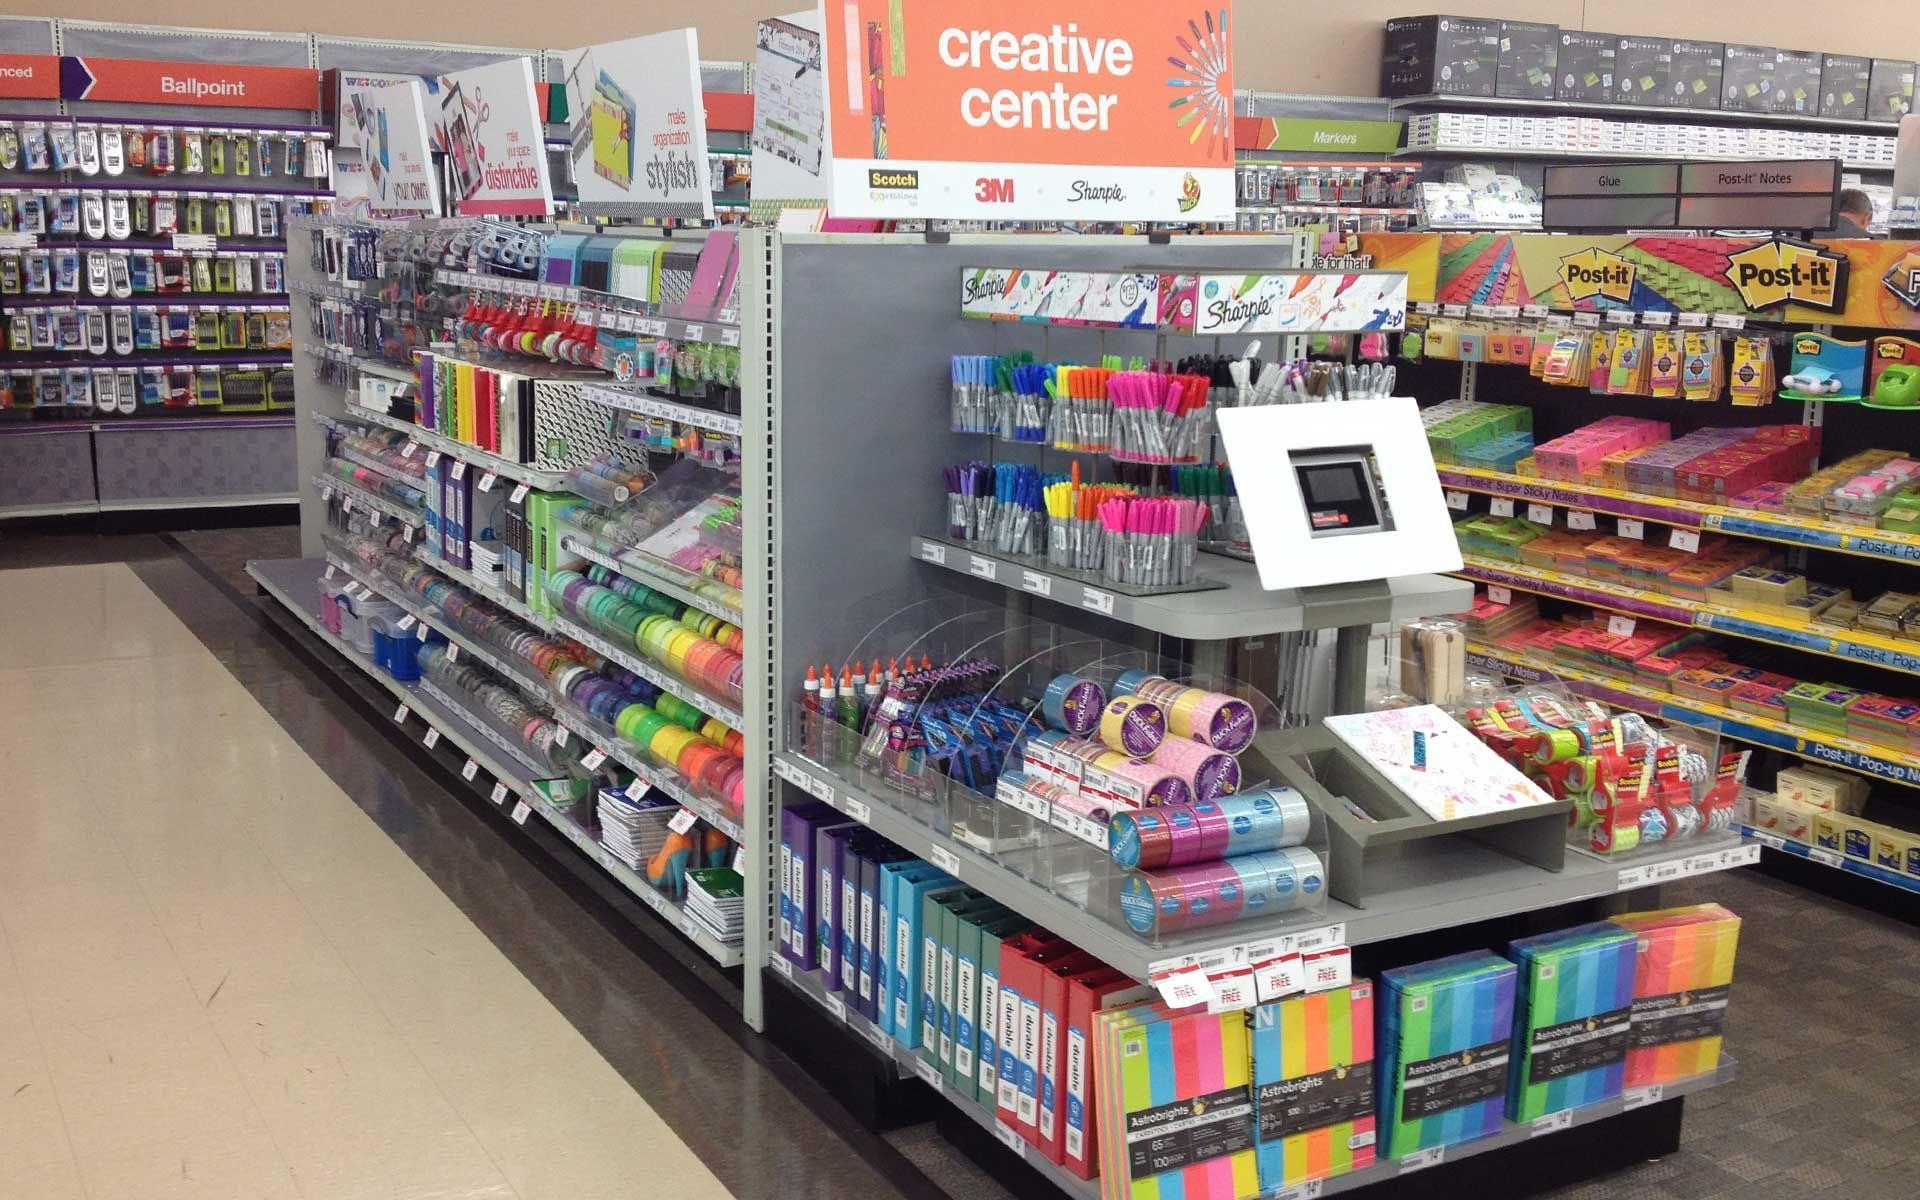 Aisle Marker Store Categories